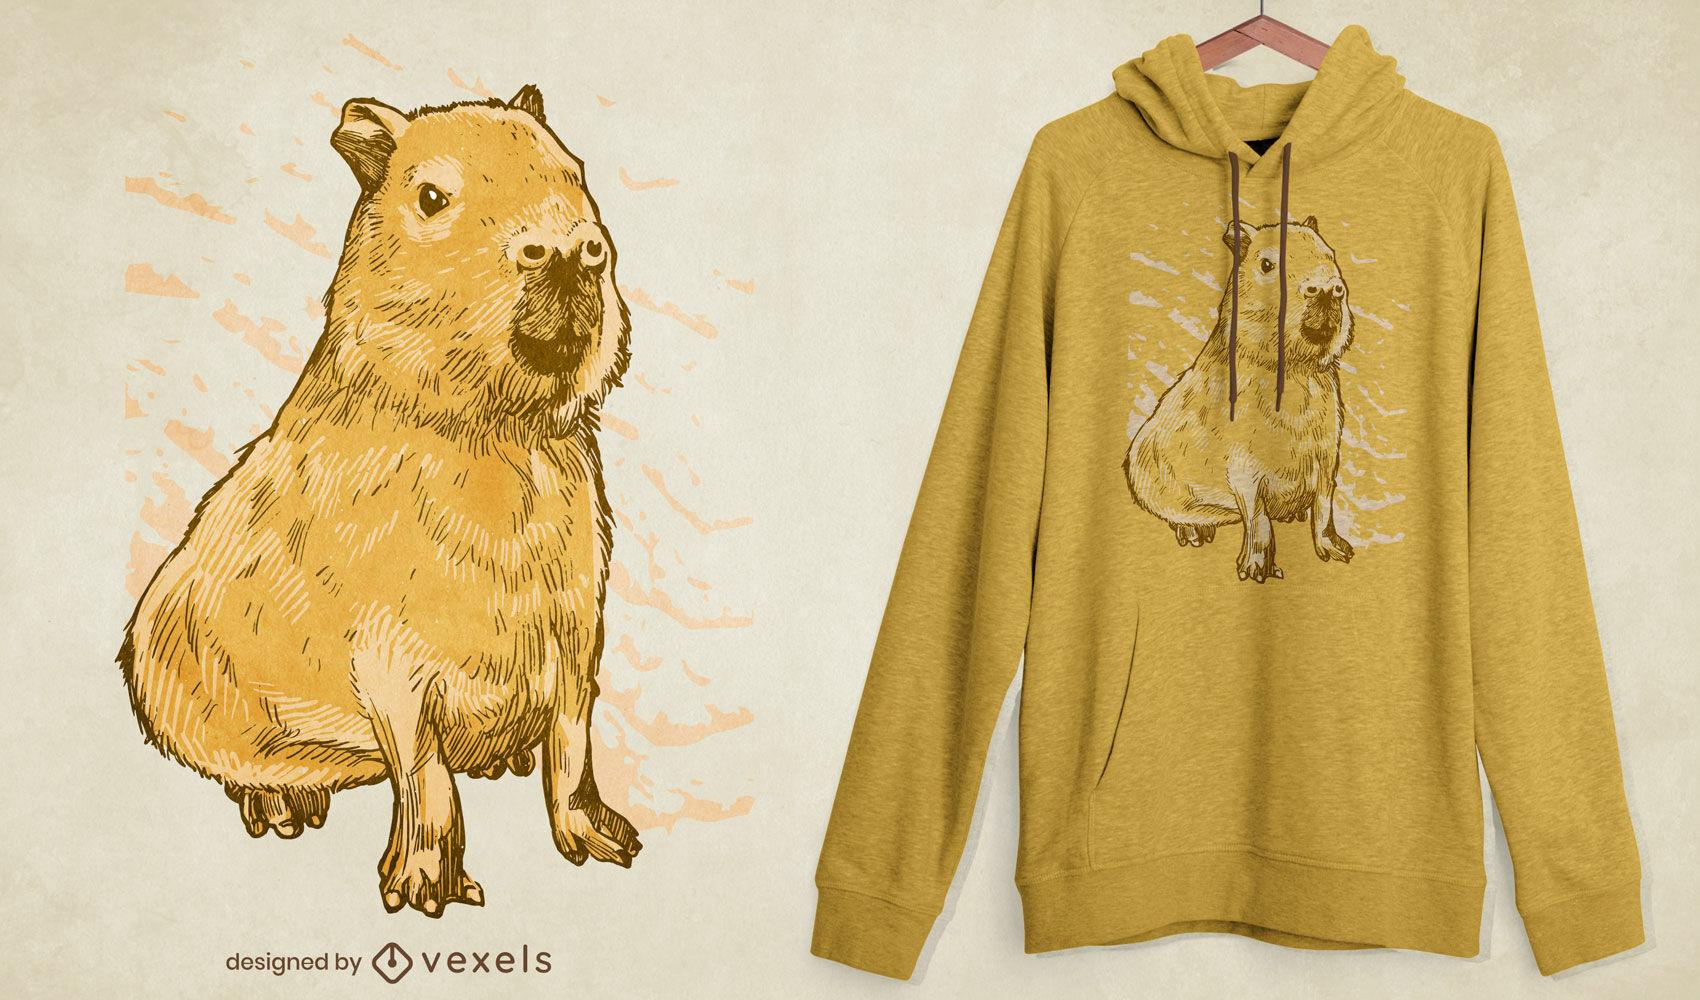 Realistic capybara animal t-shirt design